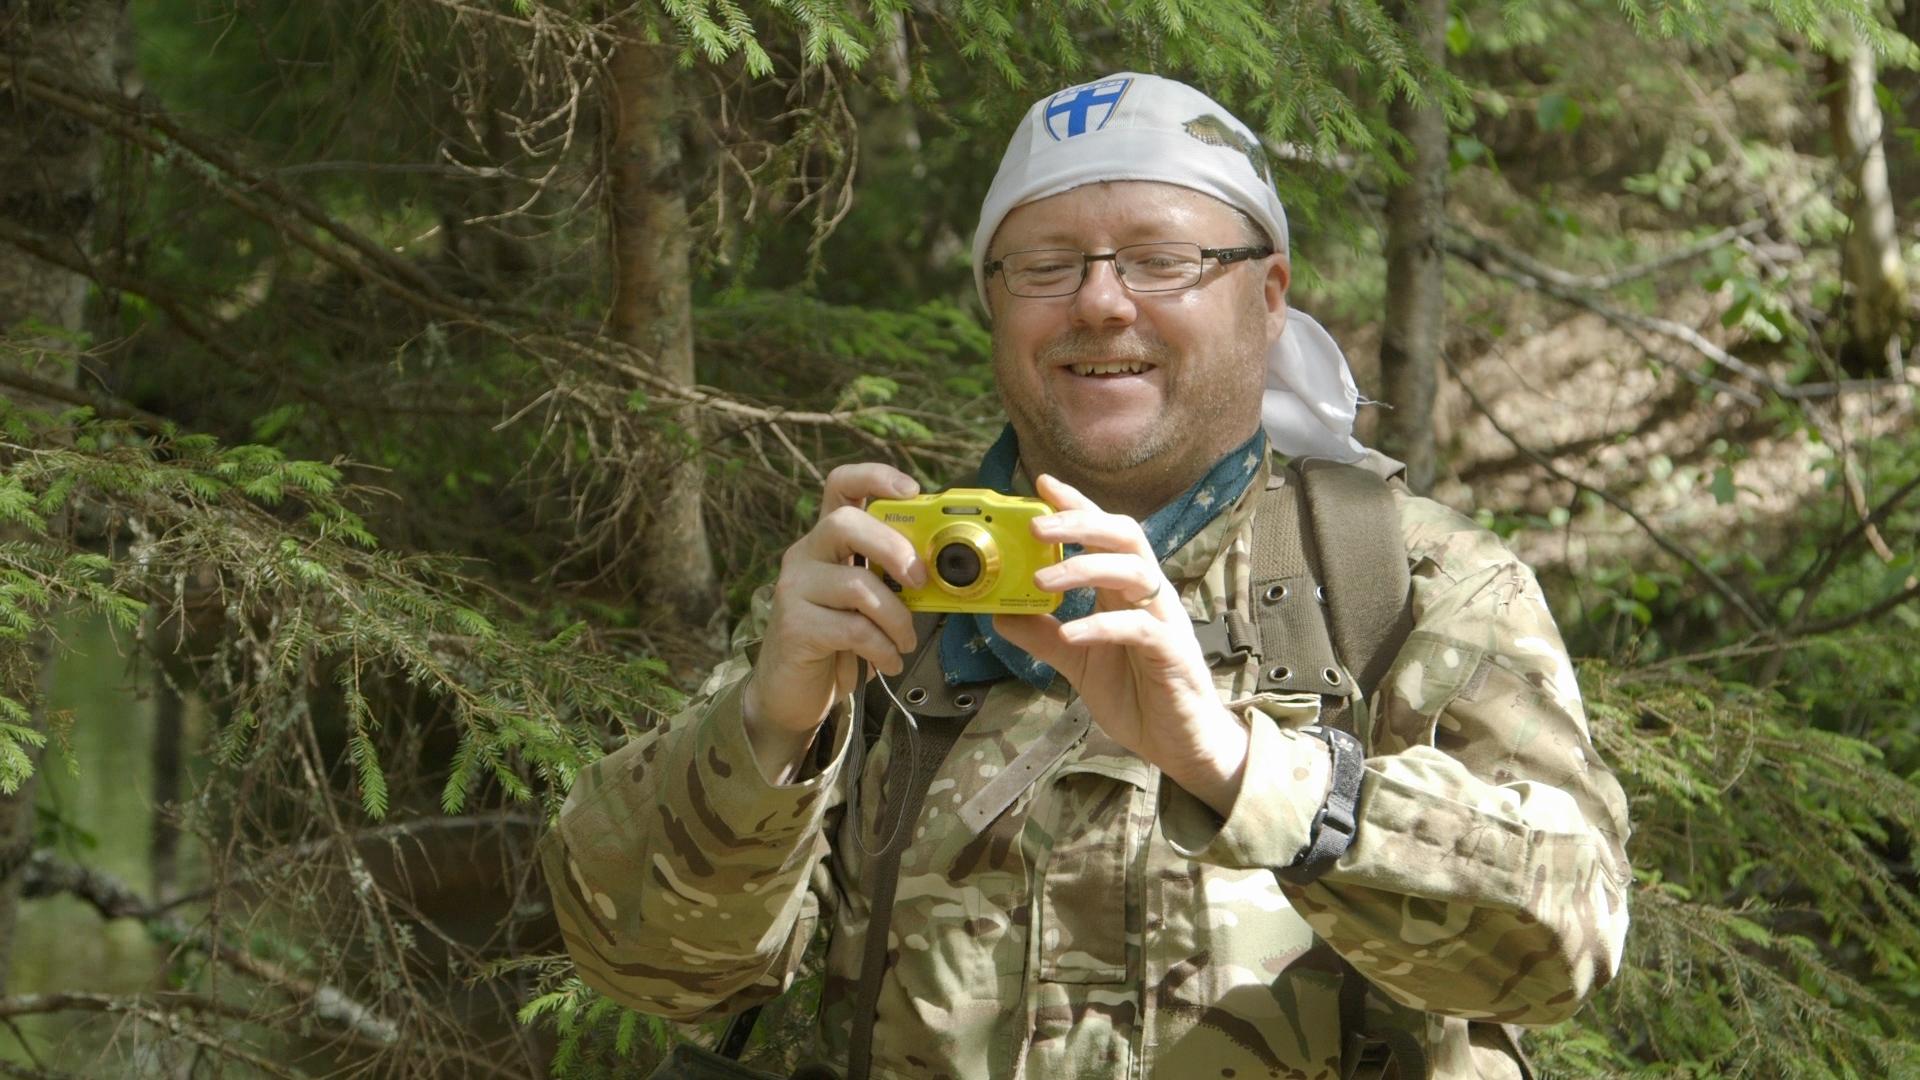 Tarmotaking photos of tom taking video of tarmo